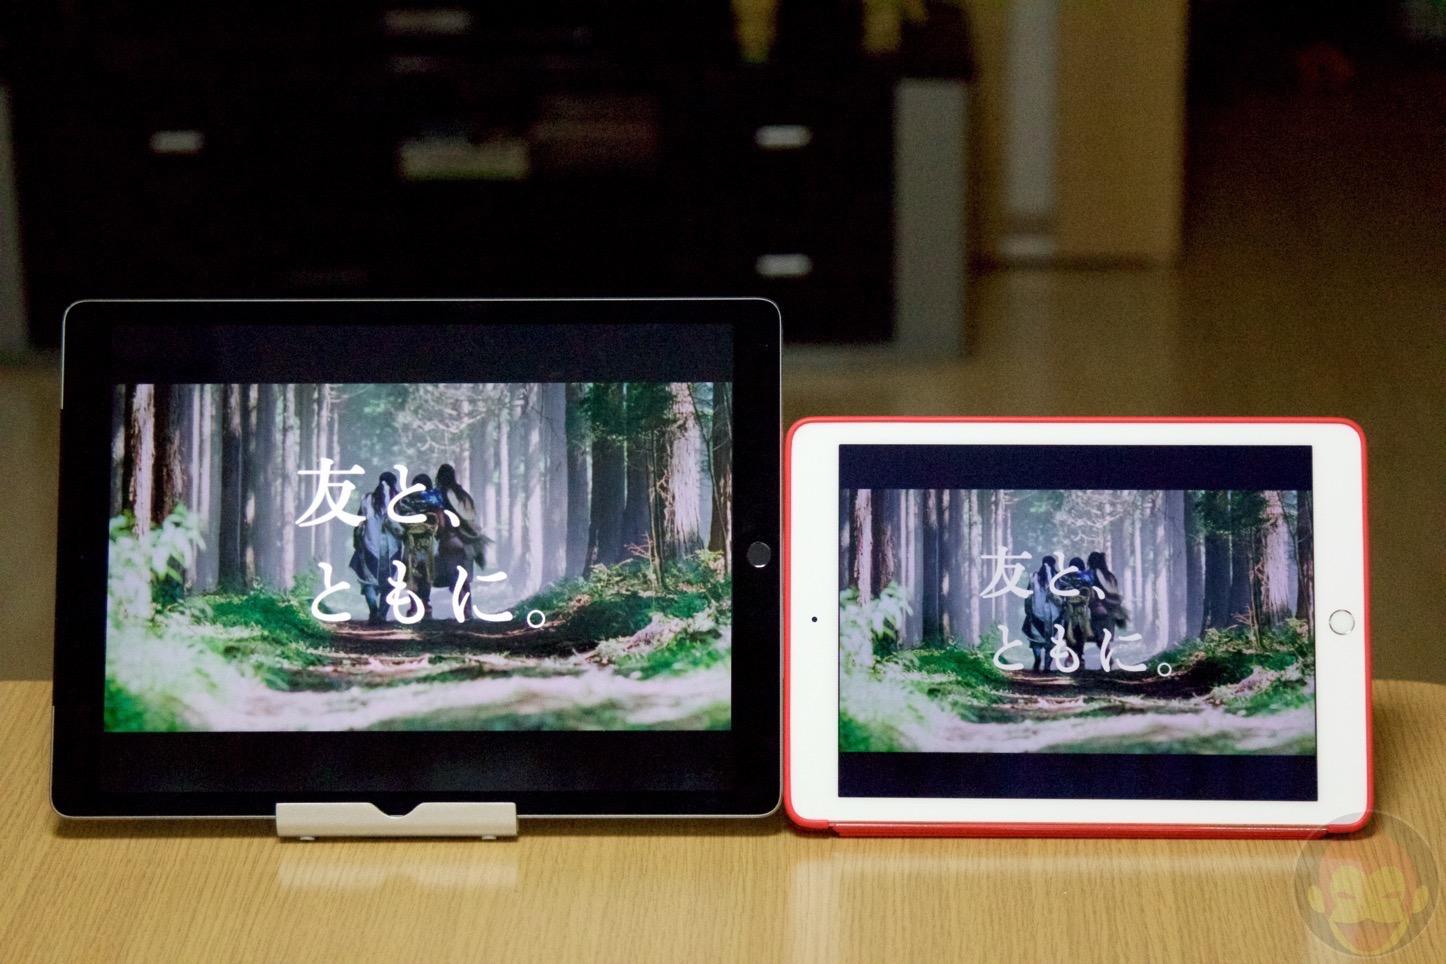 iPad-Pro-in-Depth-Review-01.jpg